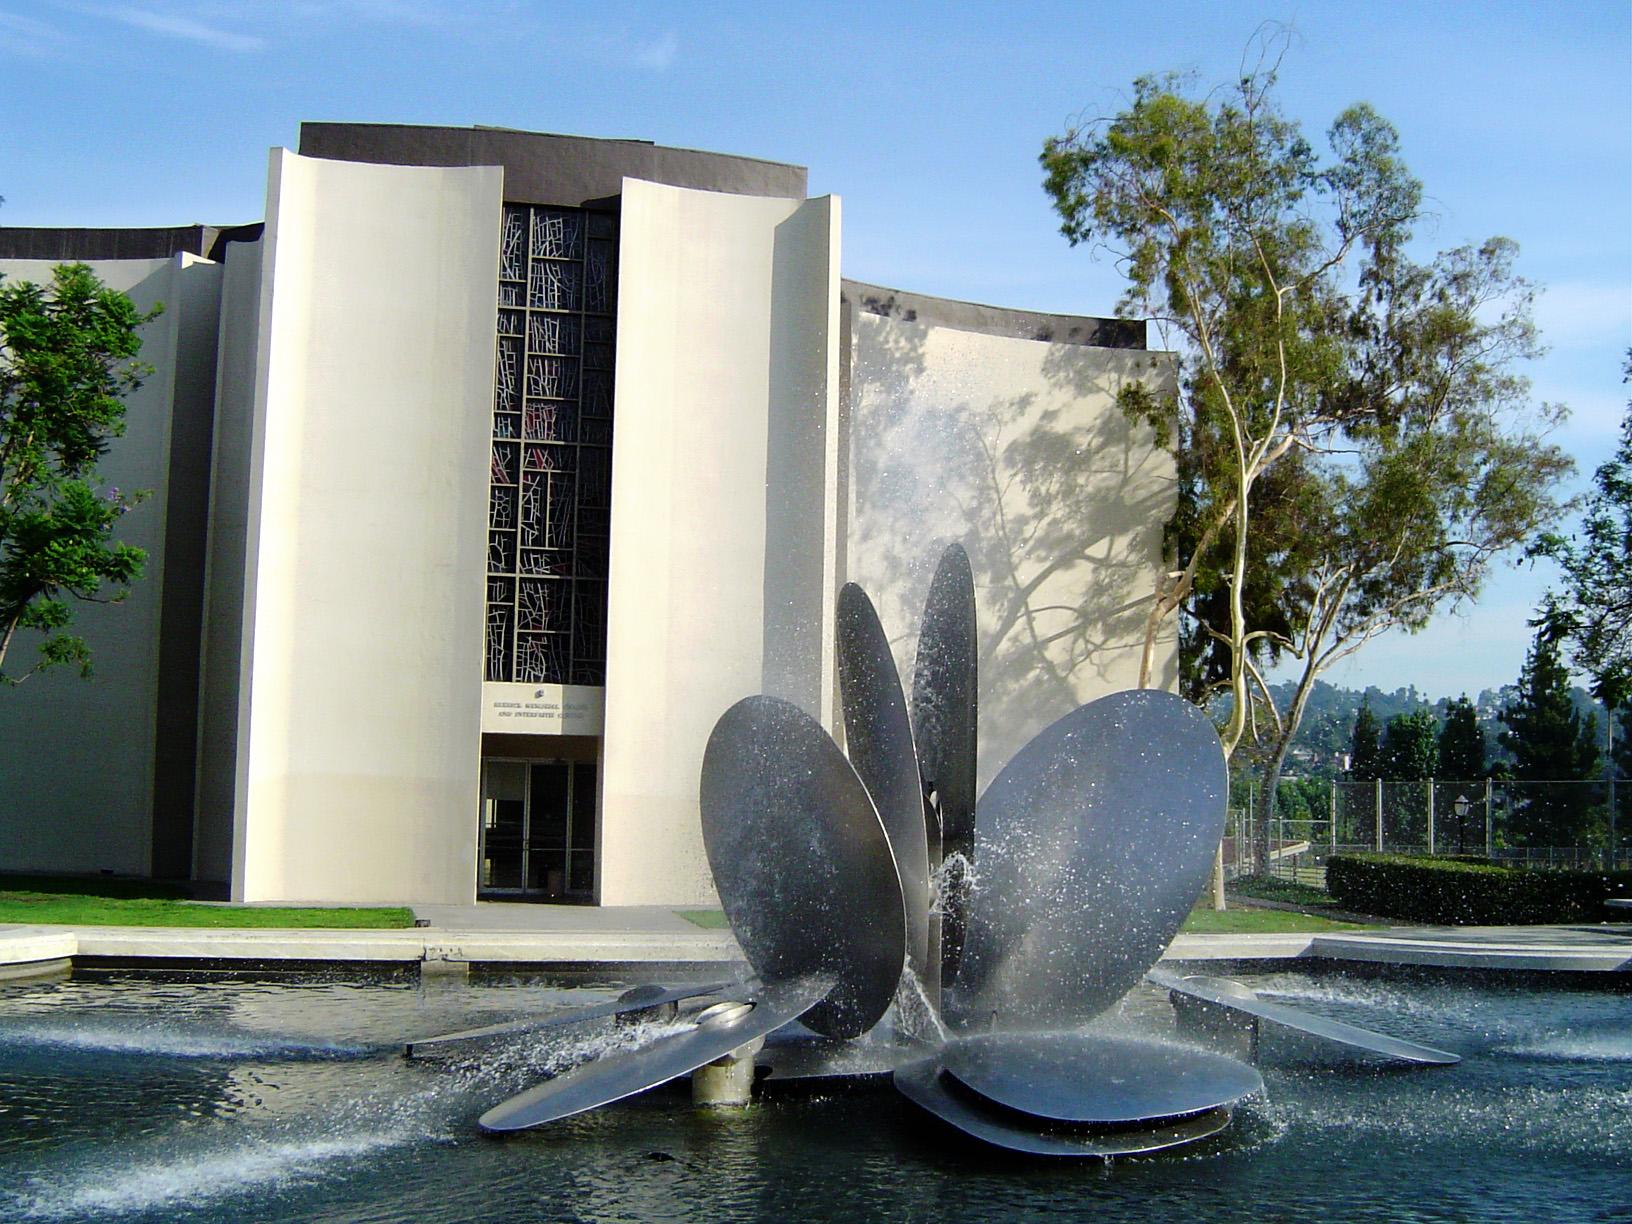 ORSL Herrik Chapel & Fountain